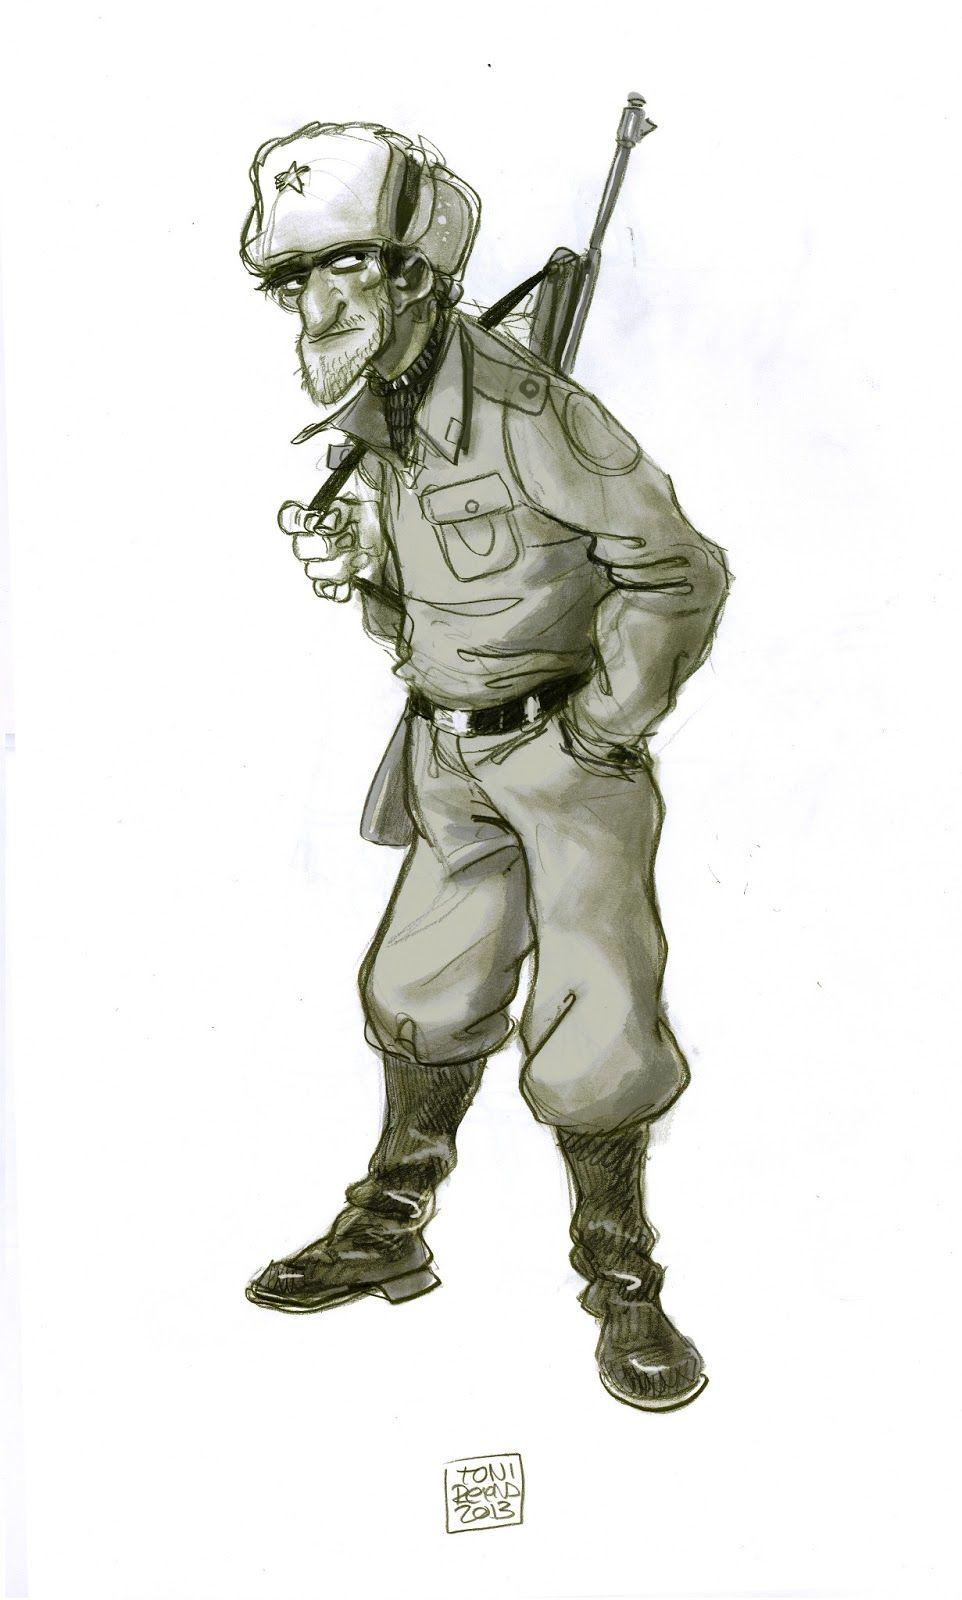 Toni Reyna soldier.jpg (962×1600)